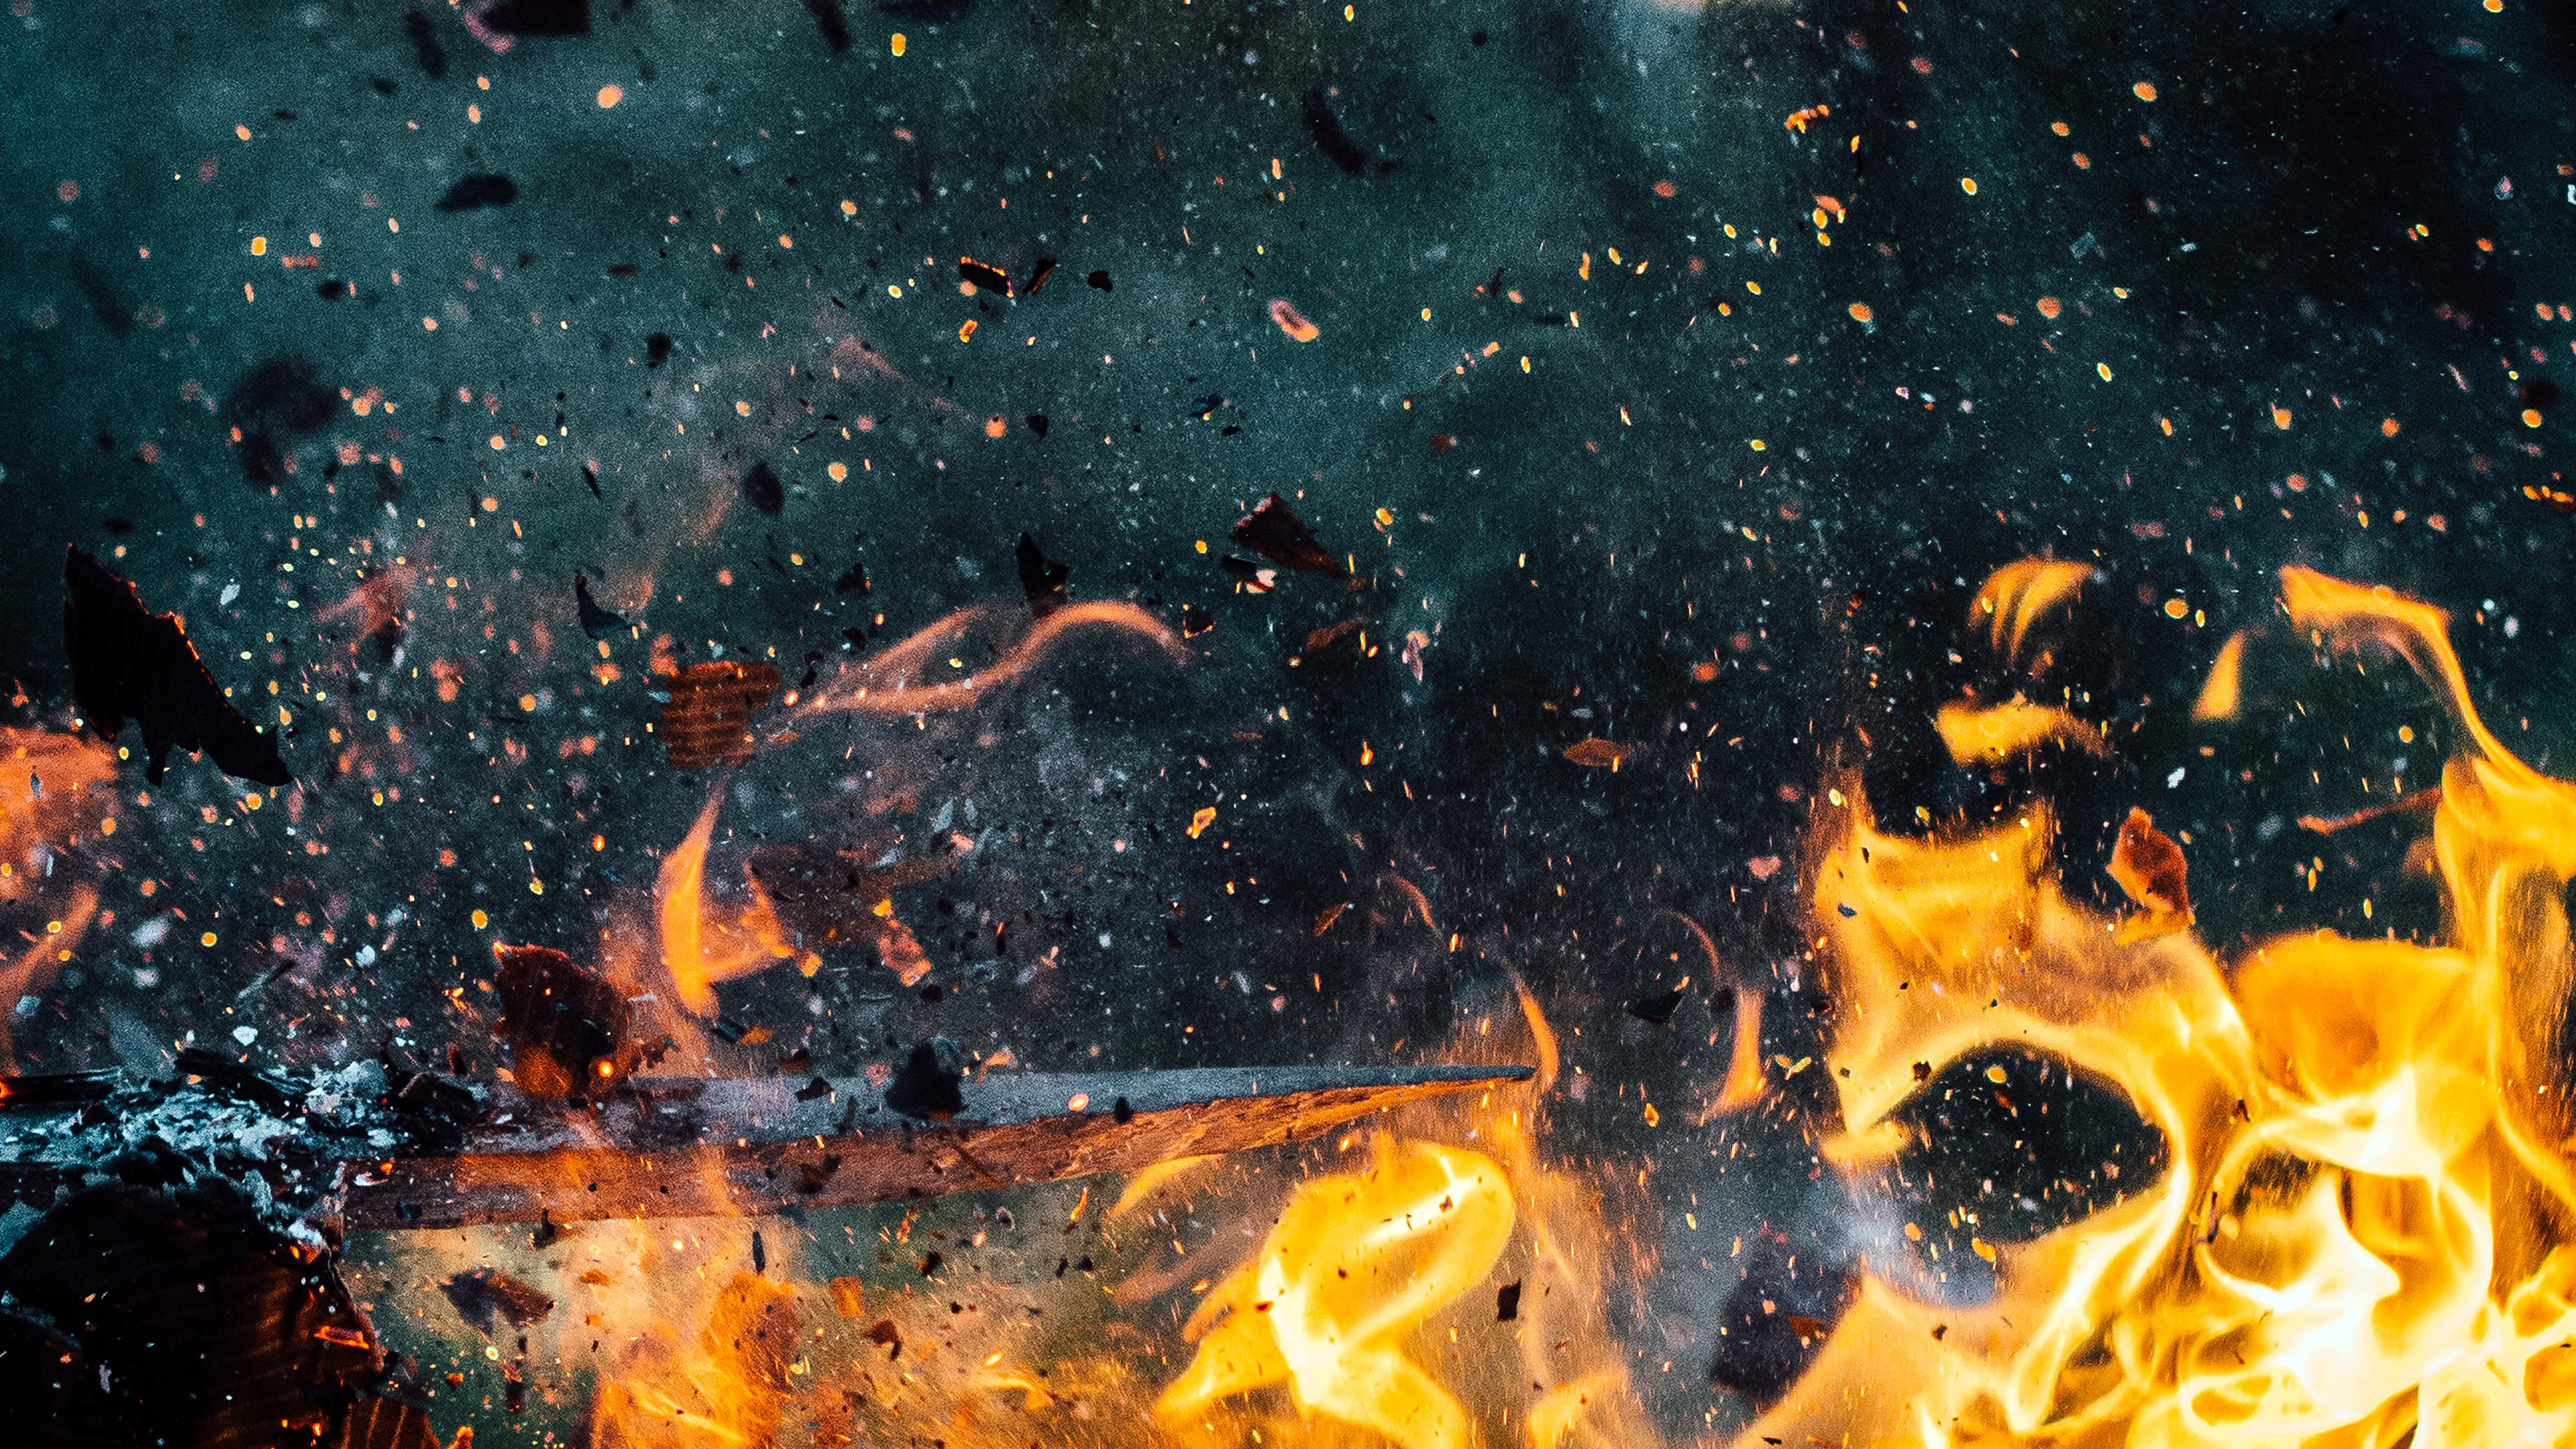 Na94 Wood Explosion Fire Art Wallpaper